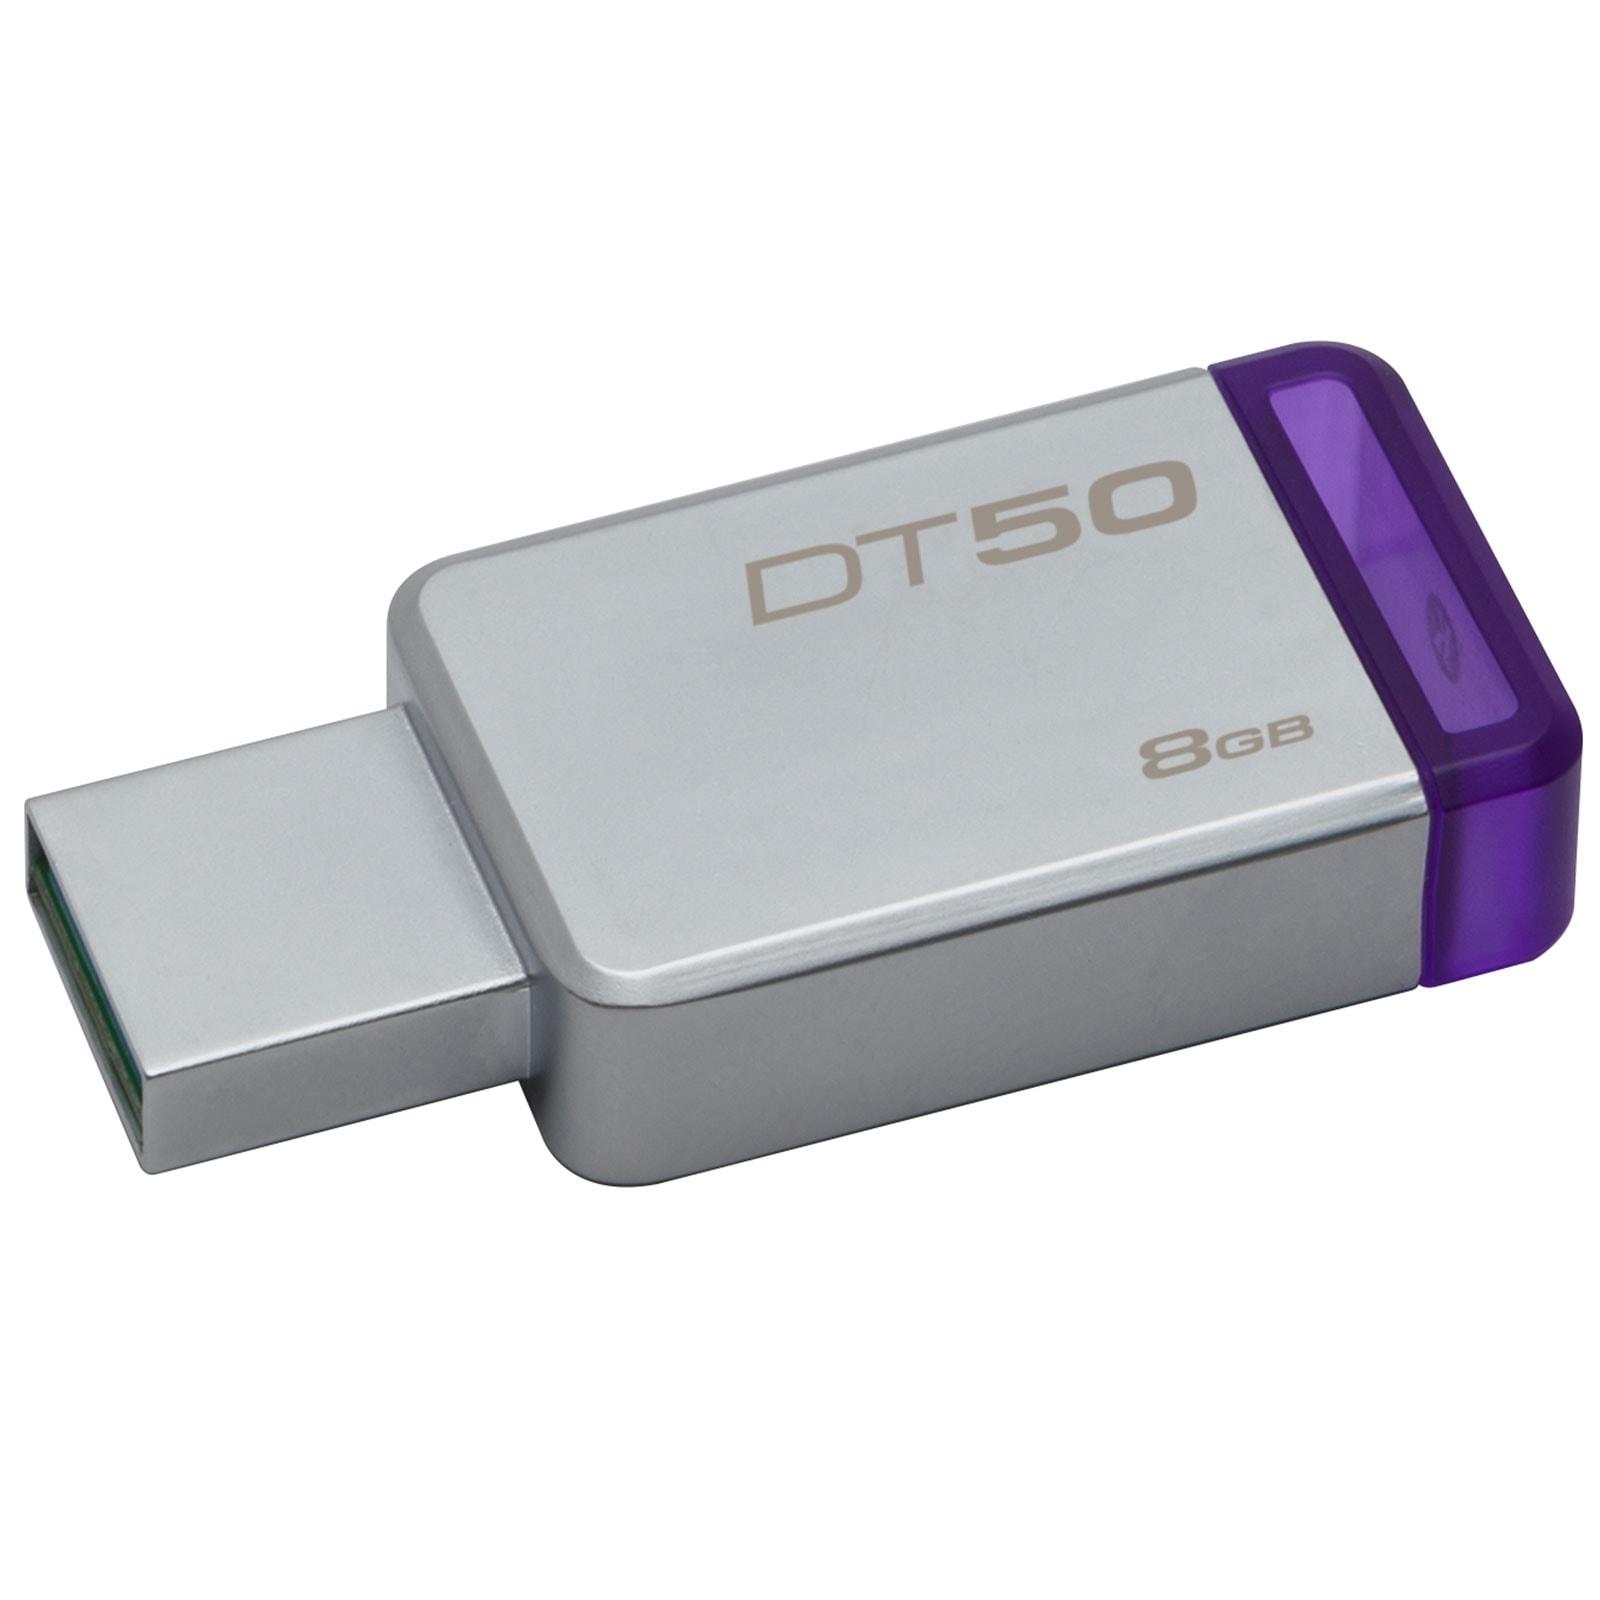 Kingston DataTraveler 50 8Go USB 3.1 (DT50/8GB) - Achat / Vente Clé USB sur Cybertek.fr - 0